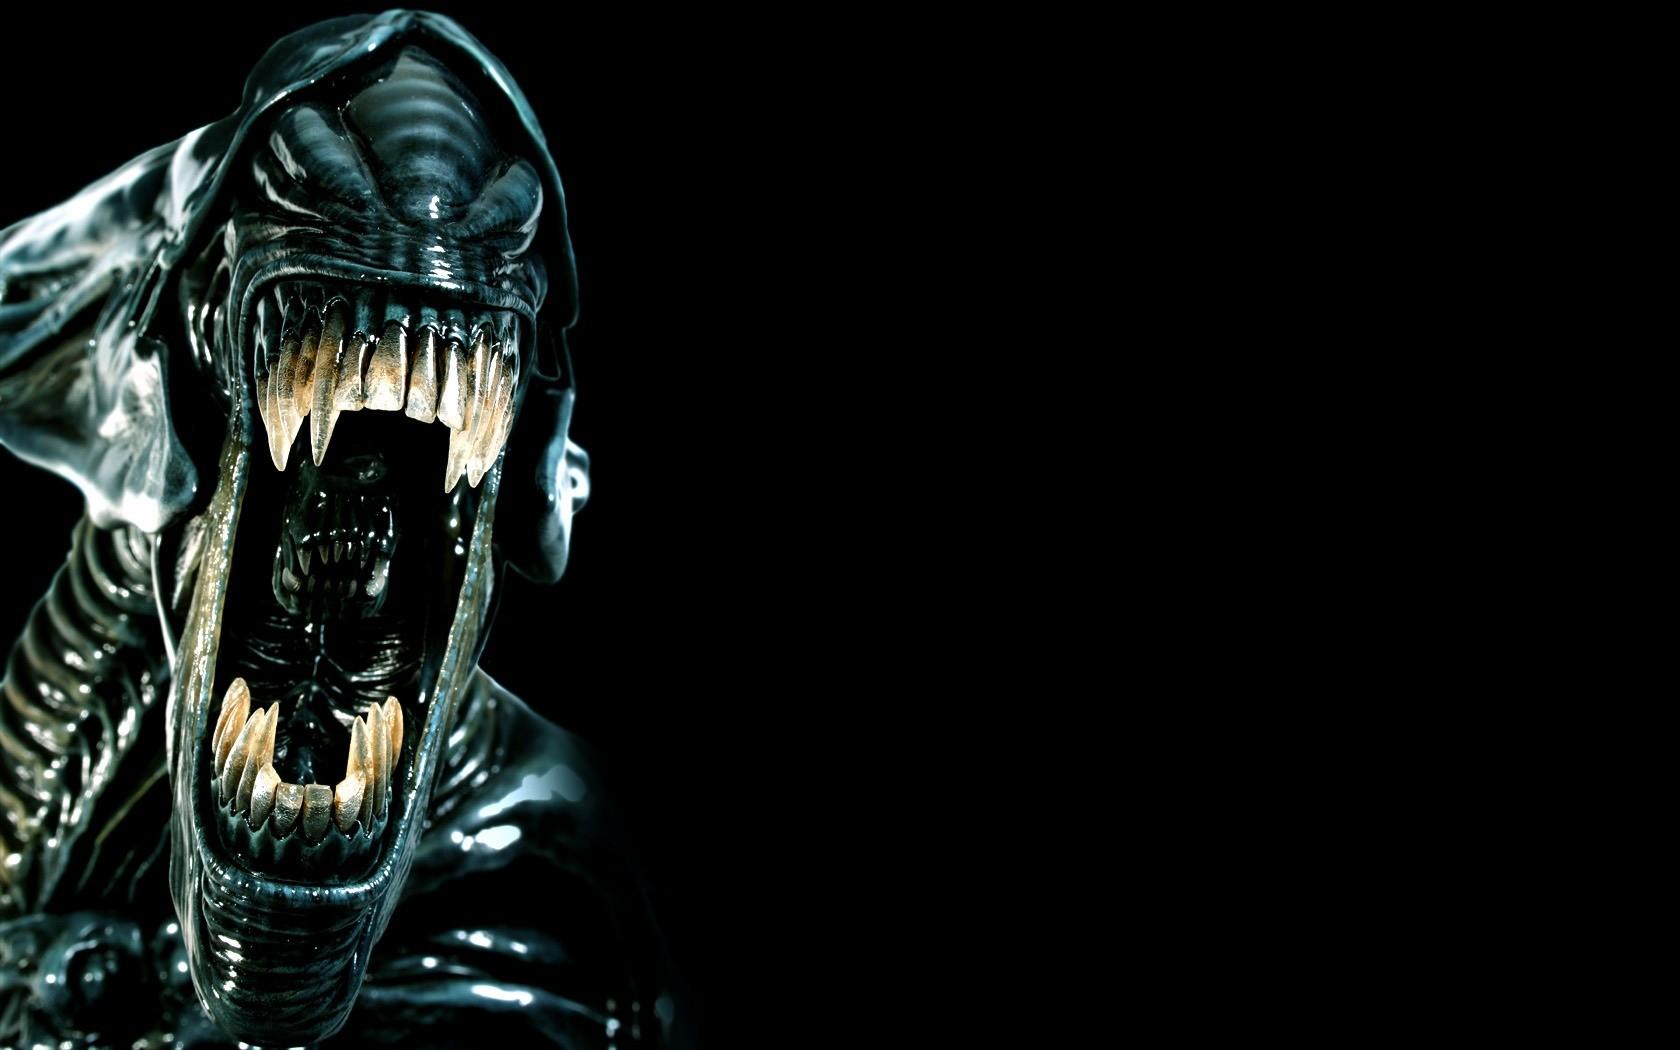 Alien Movie Wallpaper 1680x1050